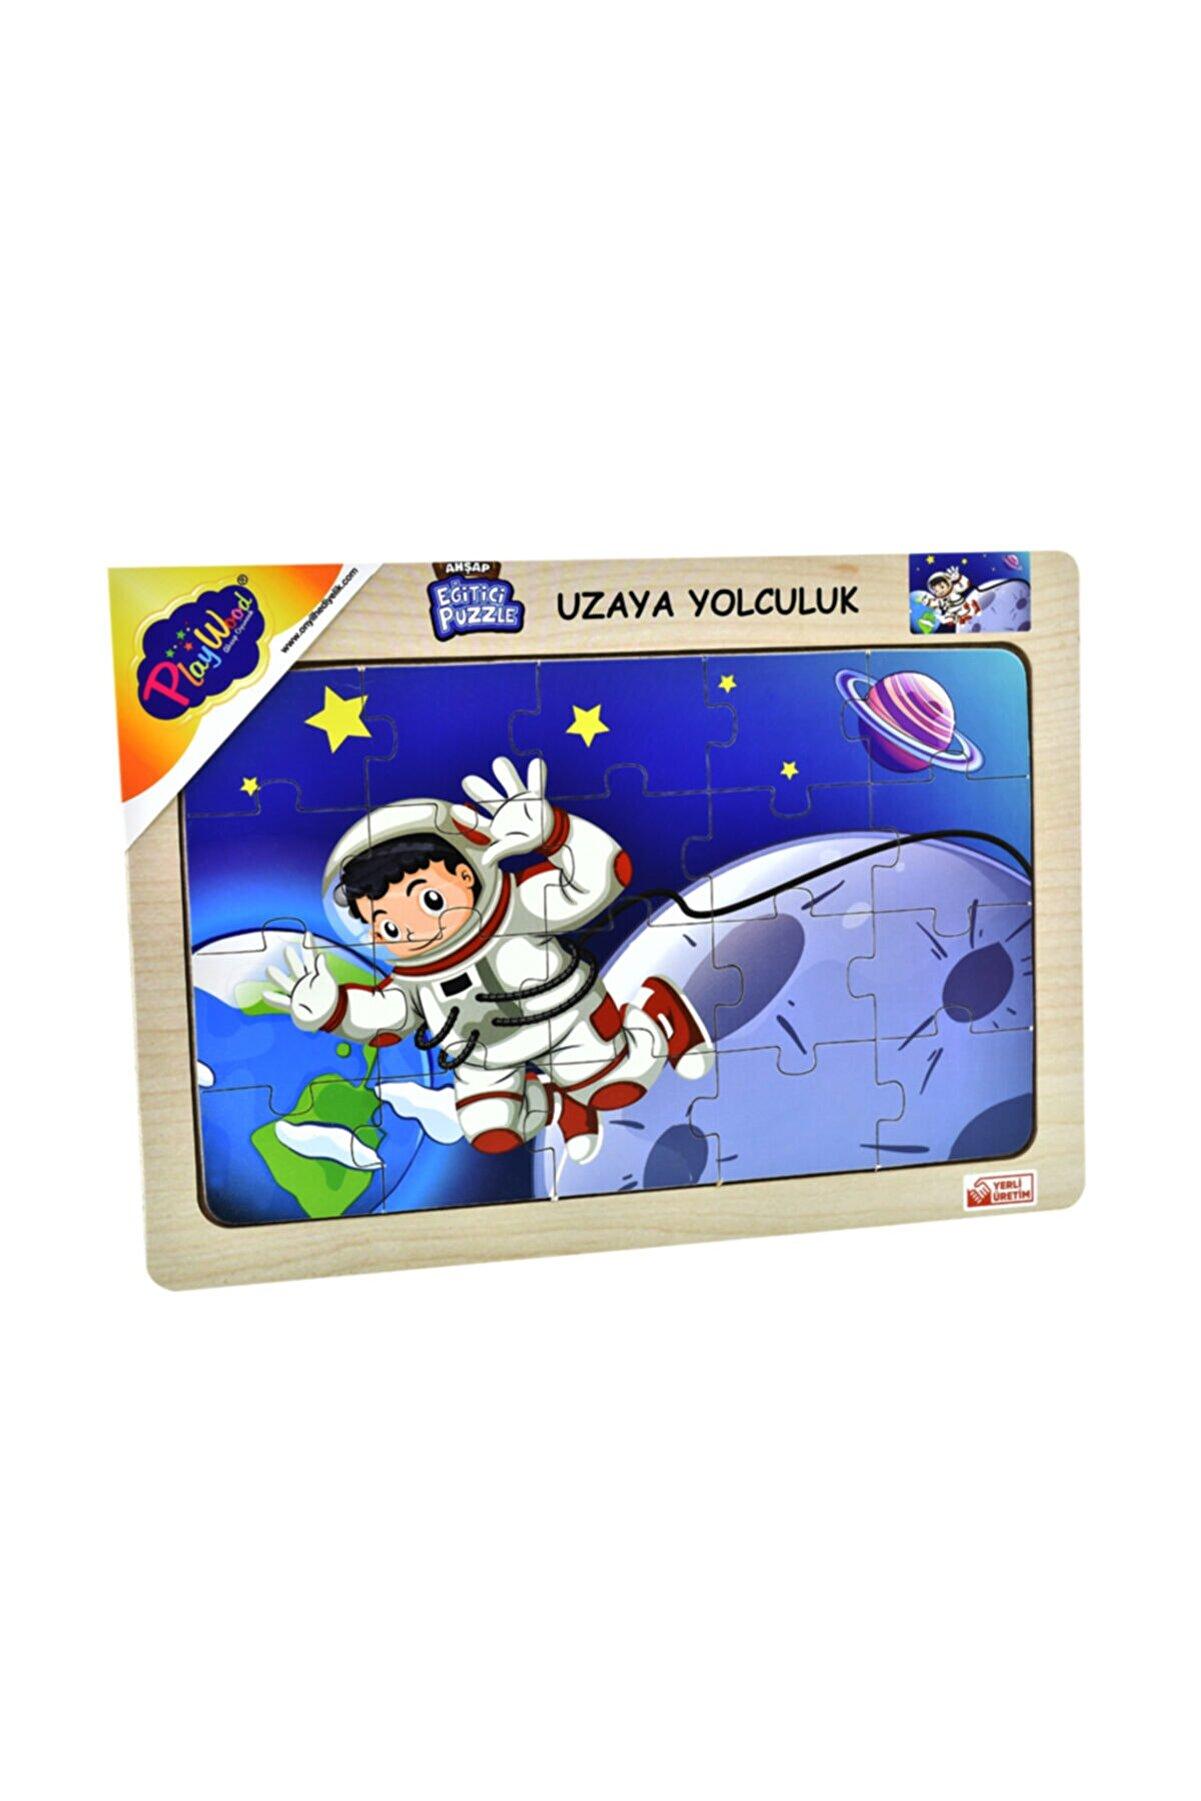 ONYIL OYUNCAK Playwood Ahşap Eğitici Puzzle Uzaya Yolculuk